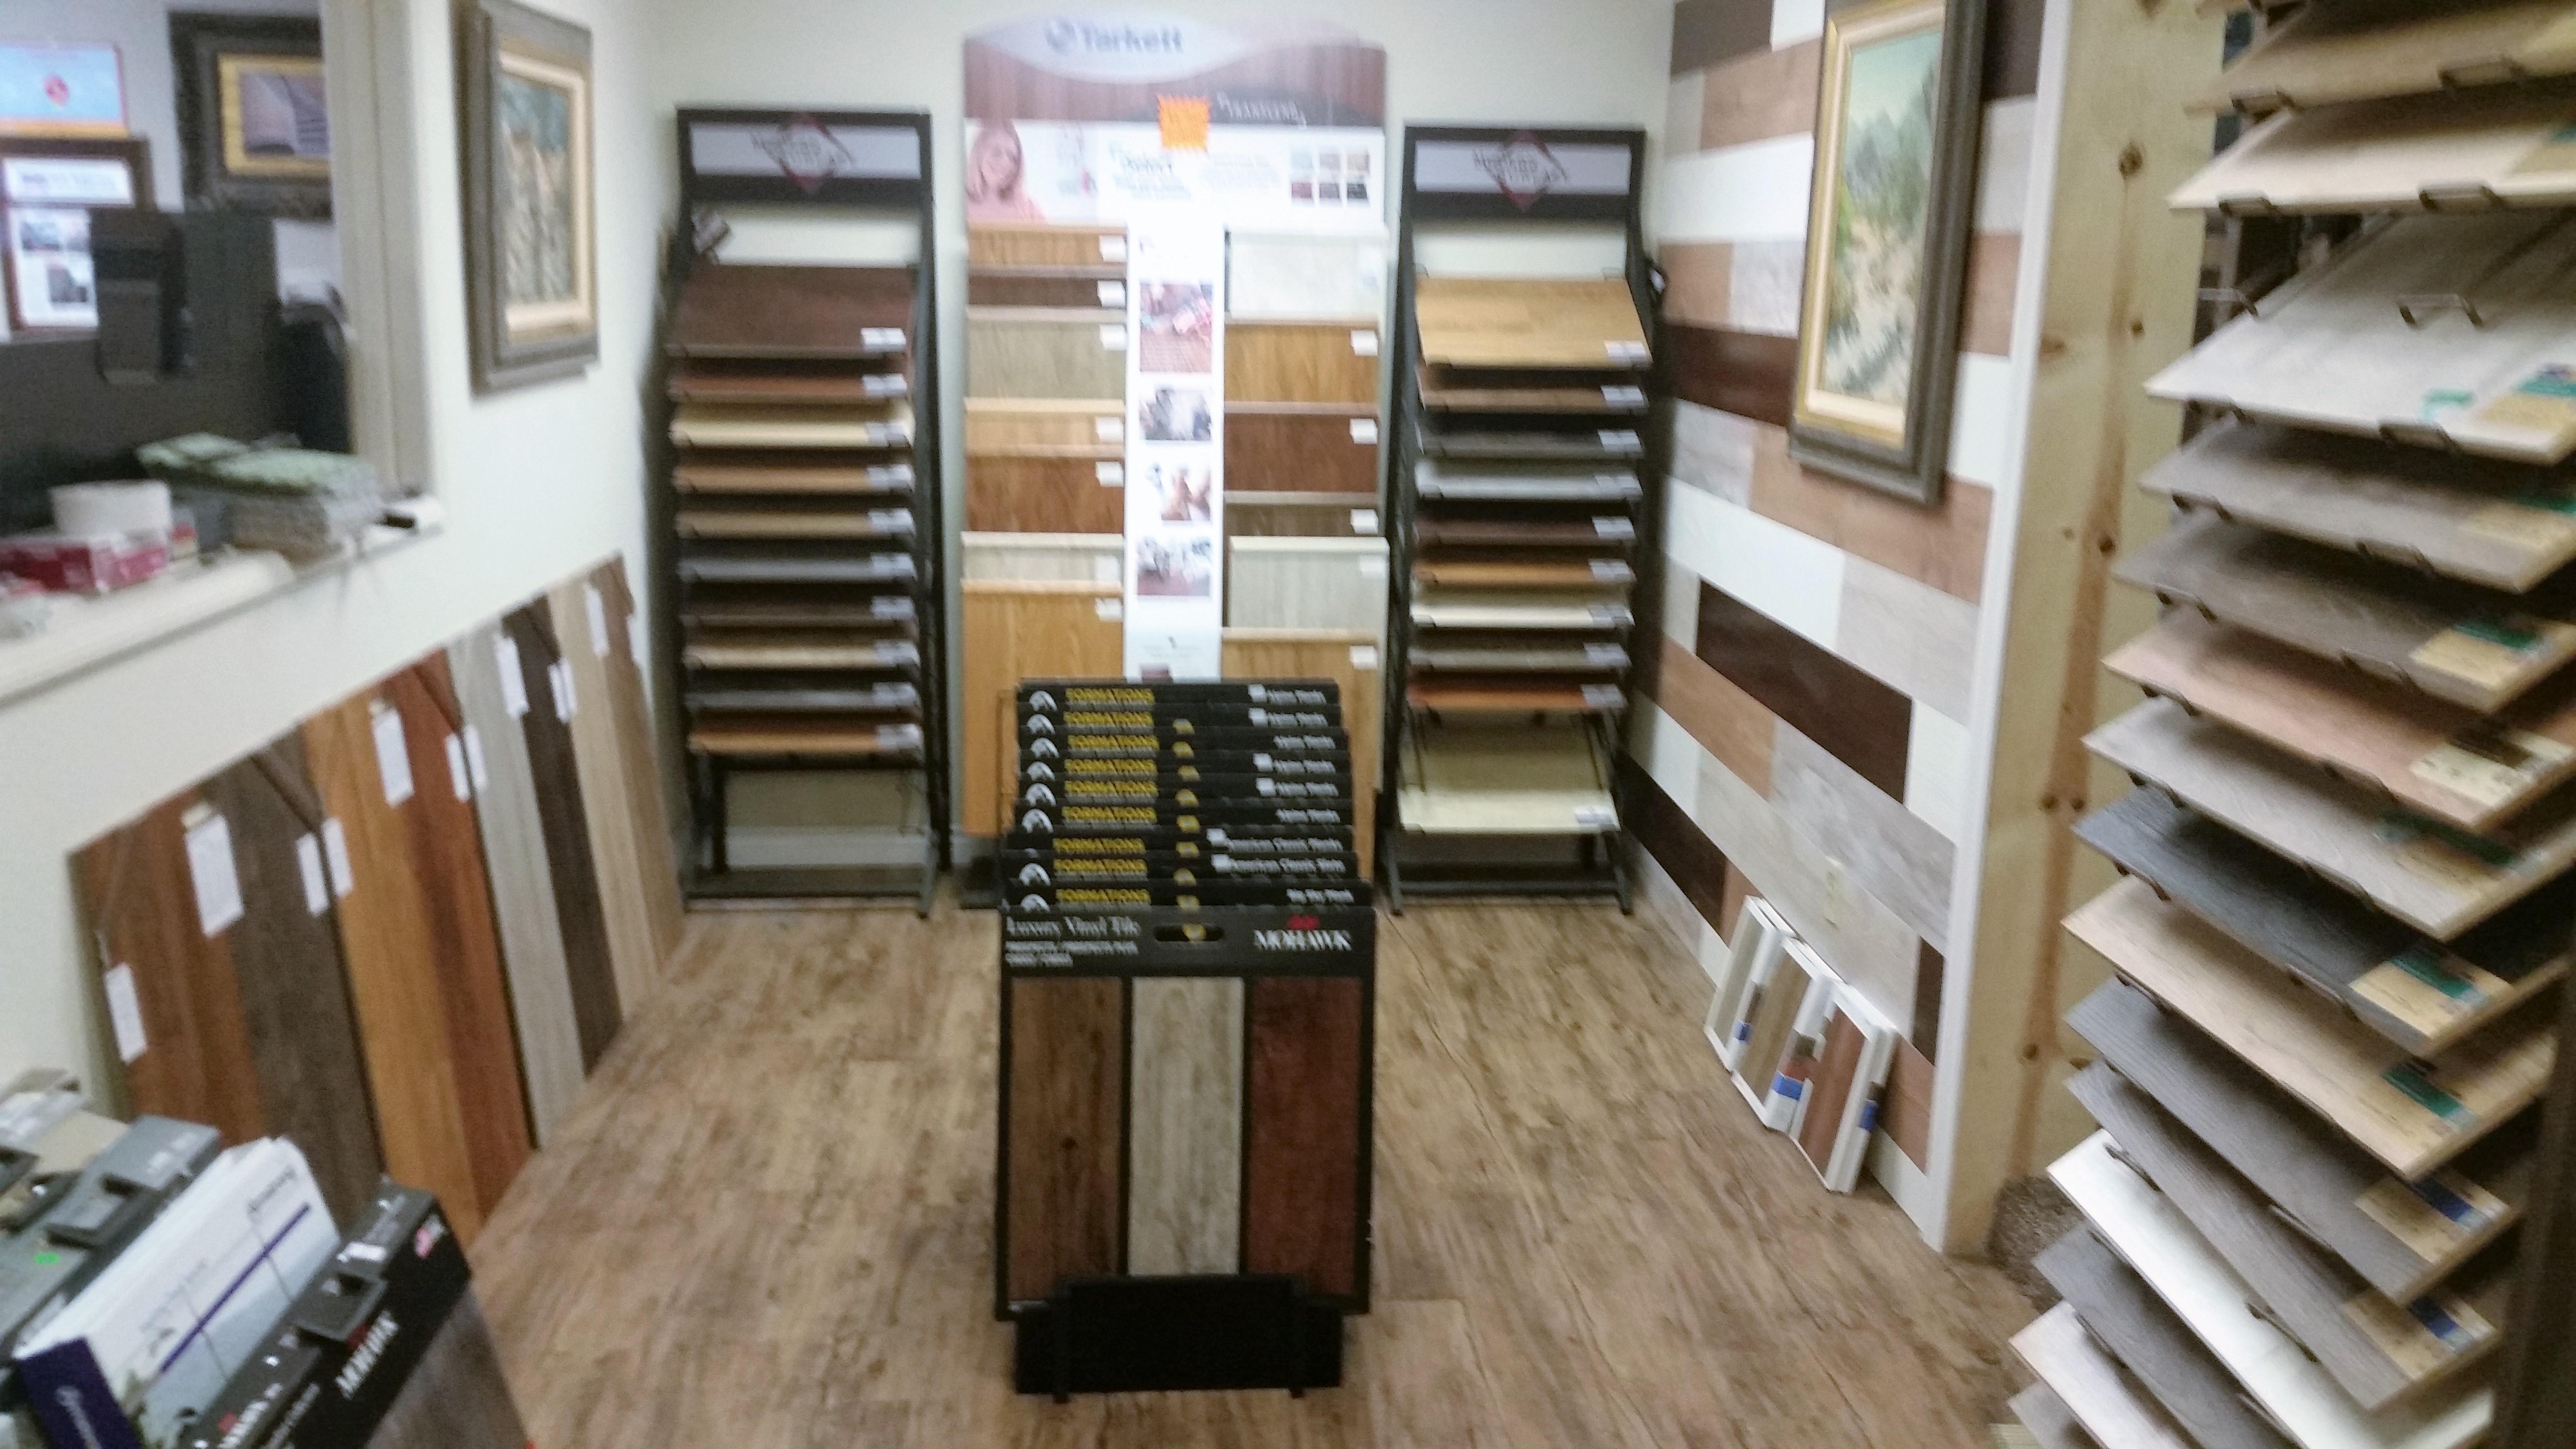 Wally's Carpet & Tile - 33328 Calimesa Blvd, Yucaipa, CA 92399